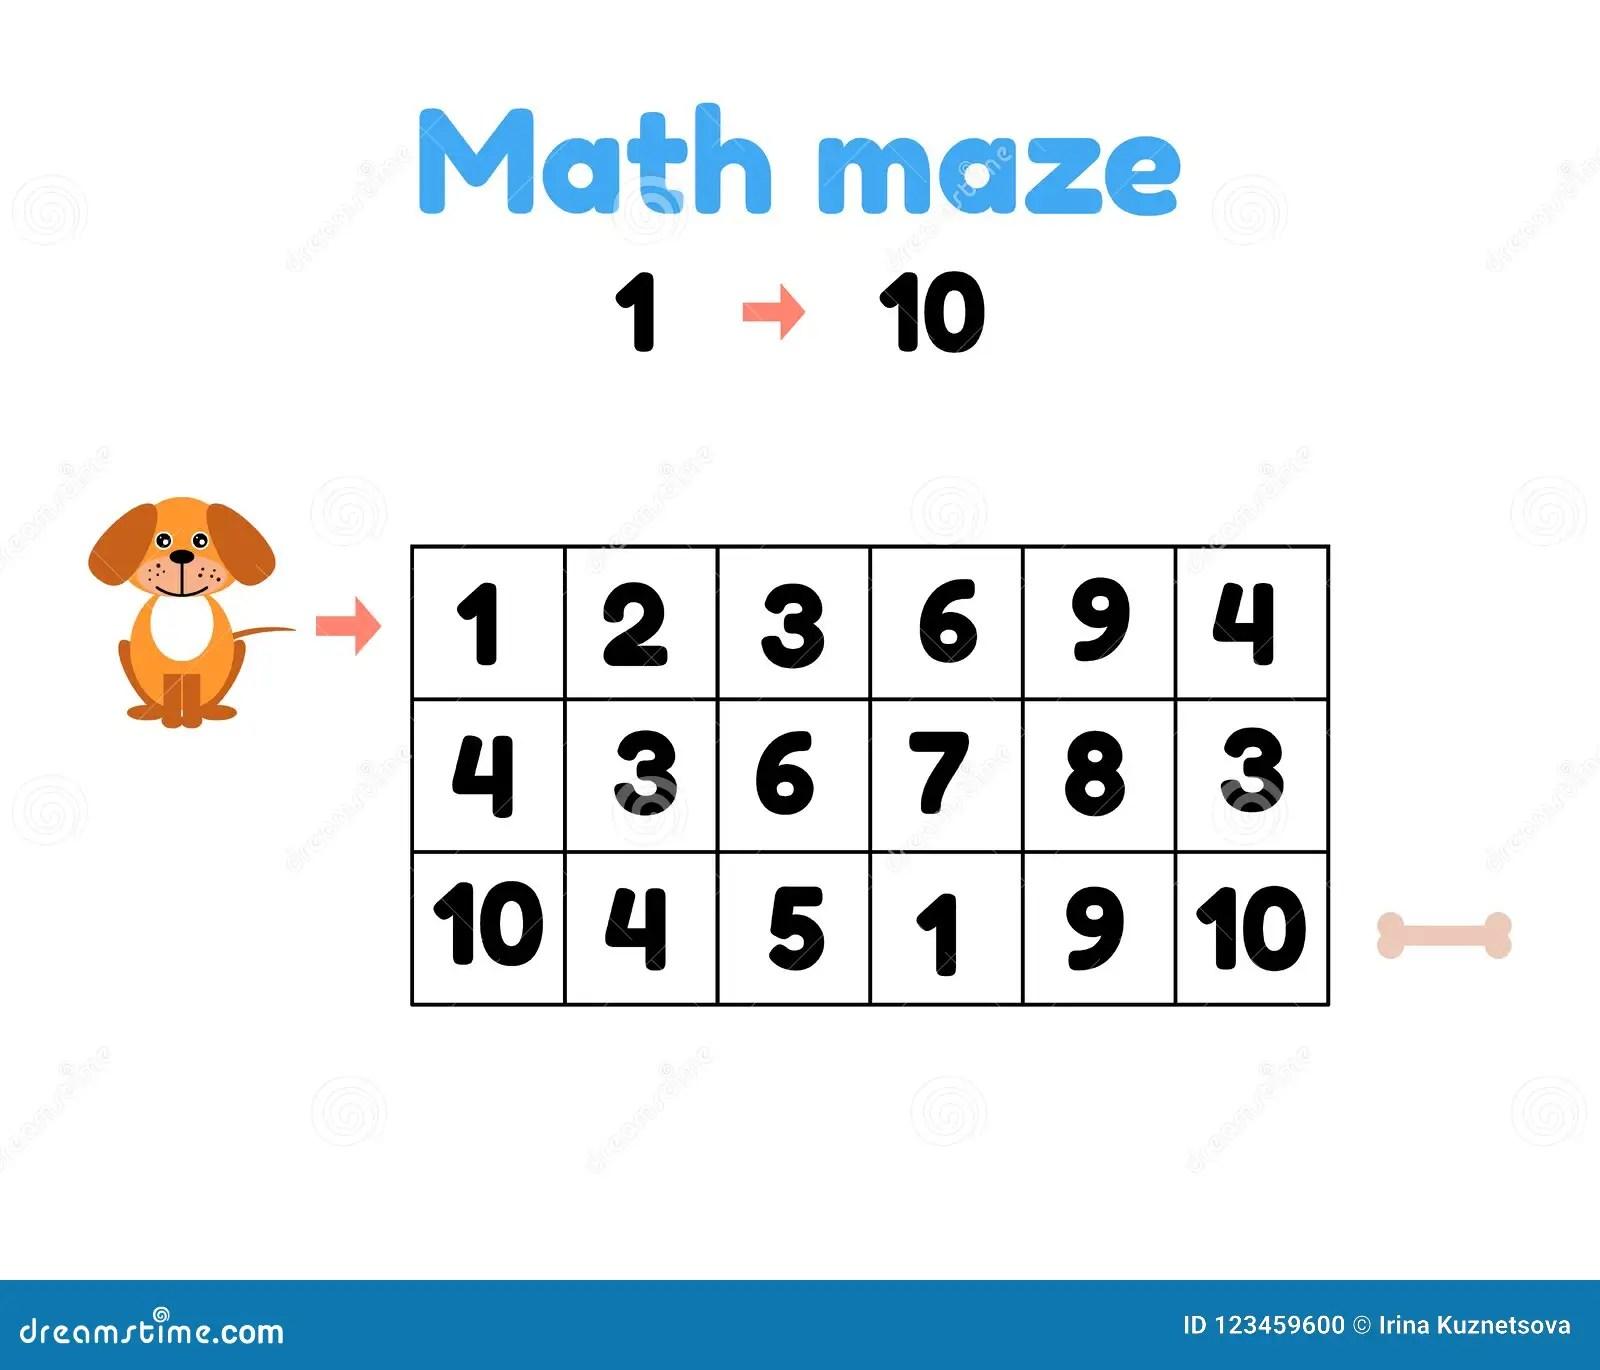 Game For Preschool Children Mathematical Maze Help The